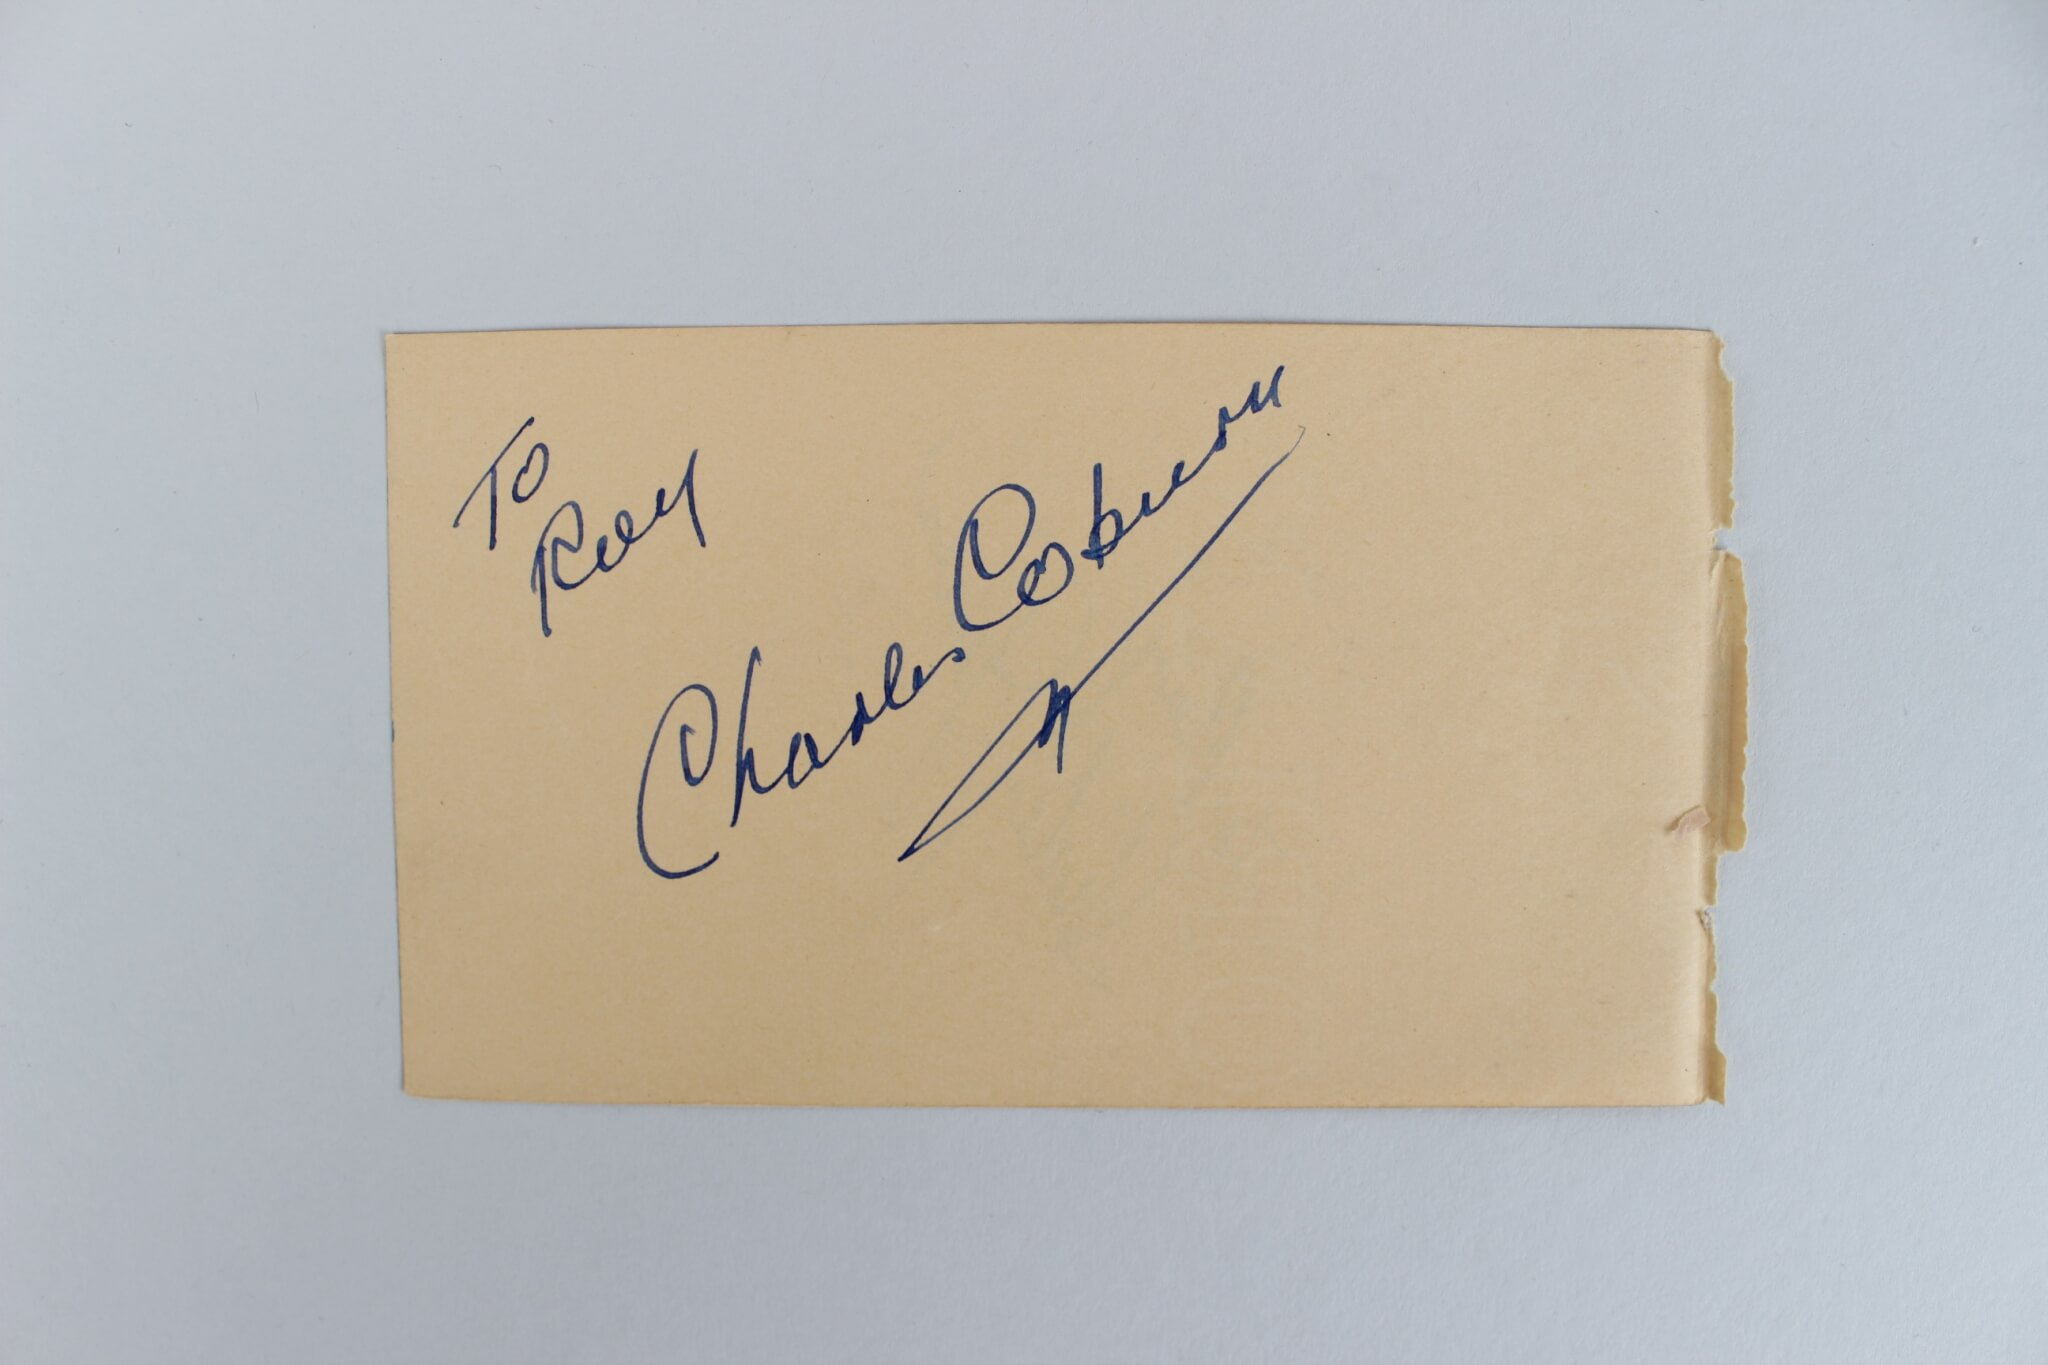 Actor/Actress Charles Coburn & Shirley Jones Signed 3×5 Cut45327_01